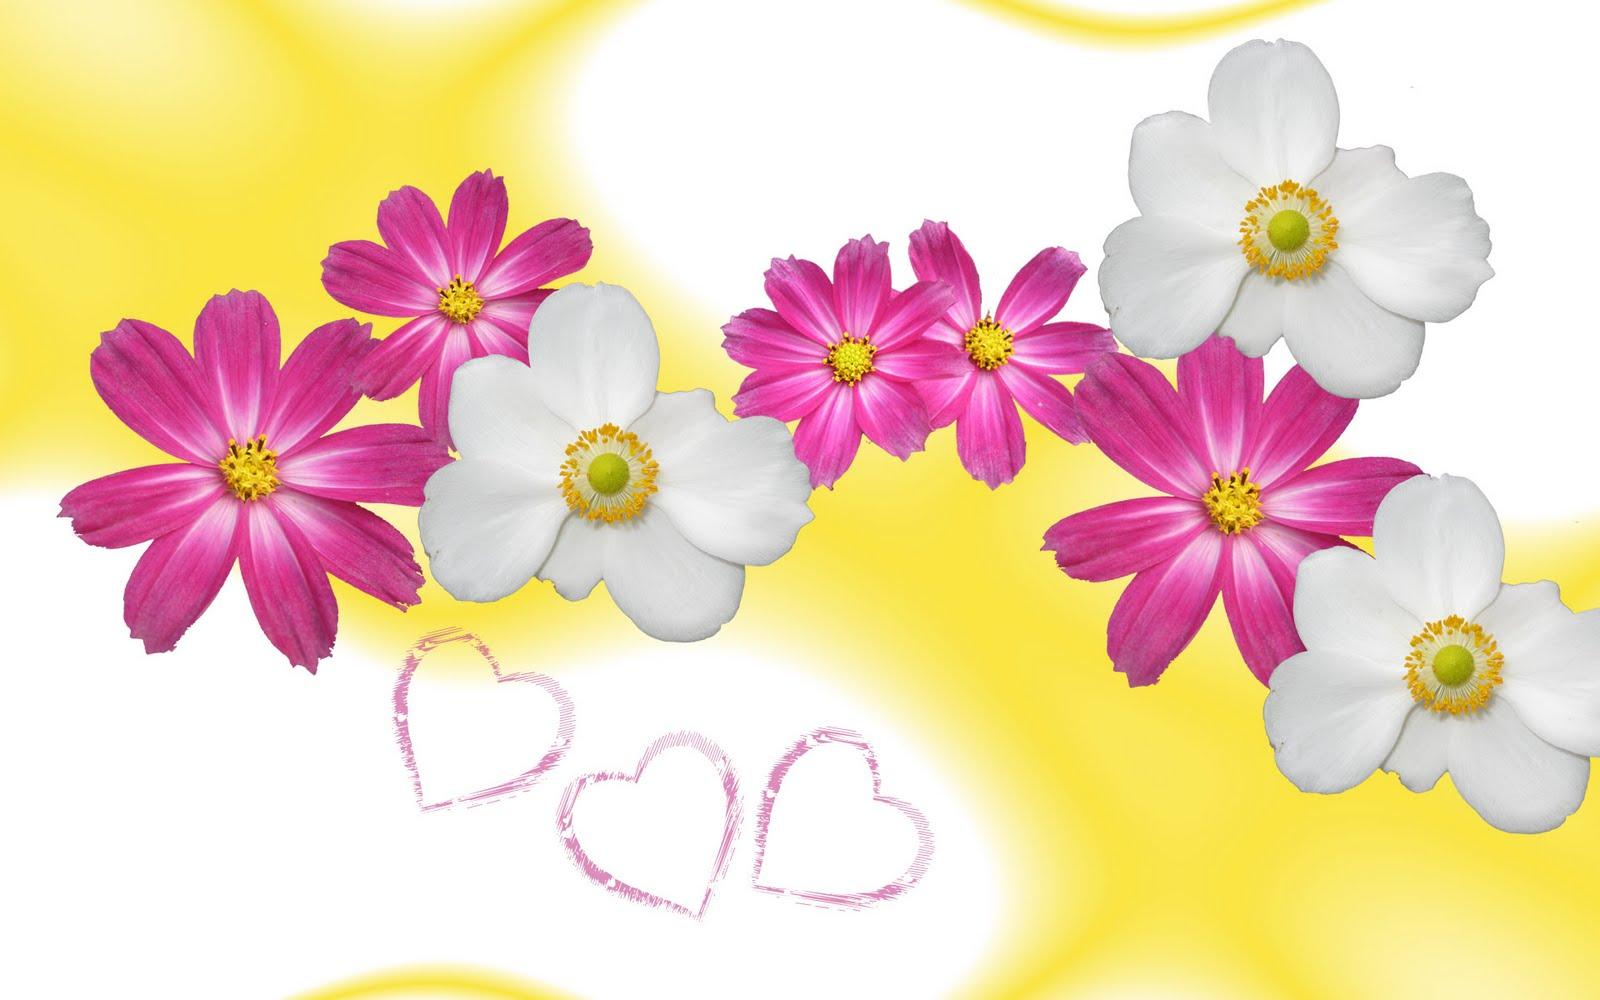 http://4.bp.blogspot.com/-zwrUv5fexGI/TdllAiu2vPI/AAAAAAAAQKg/F_OKHGBrQQc/s1600/flower-wallpaper-yellow-in-love.jpg